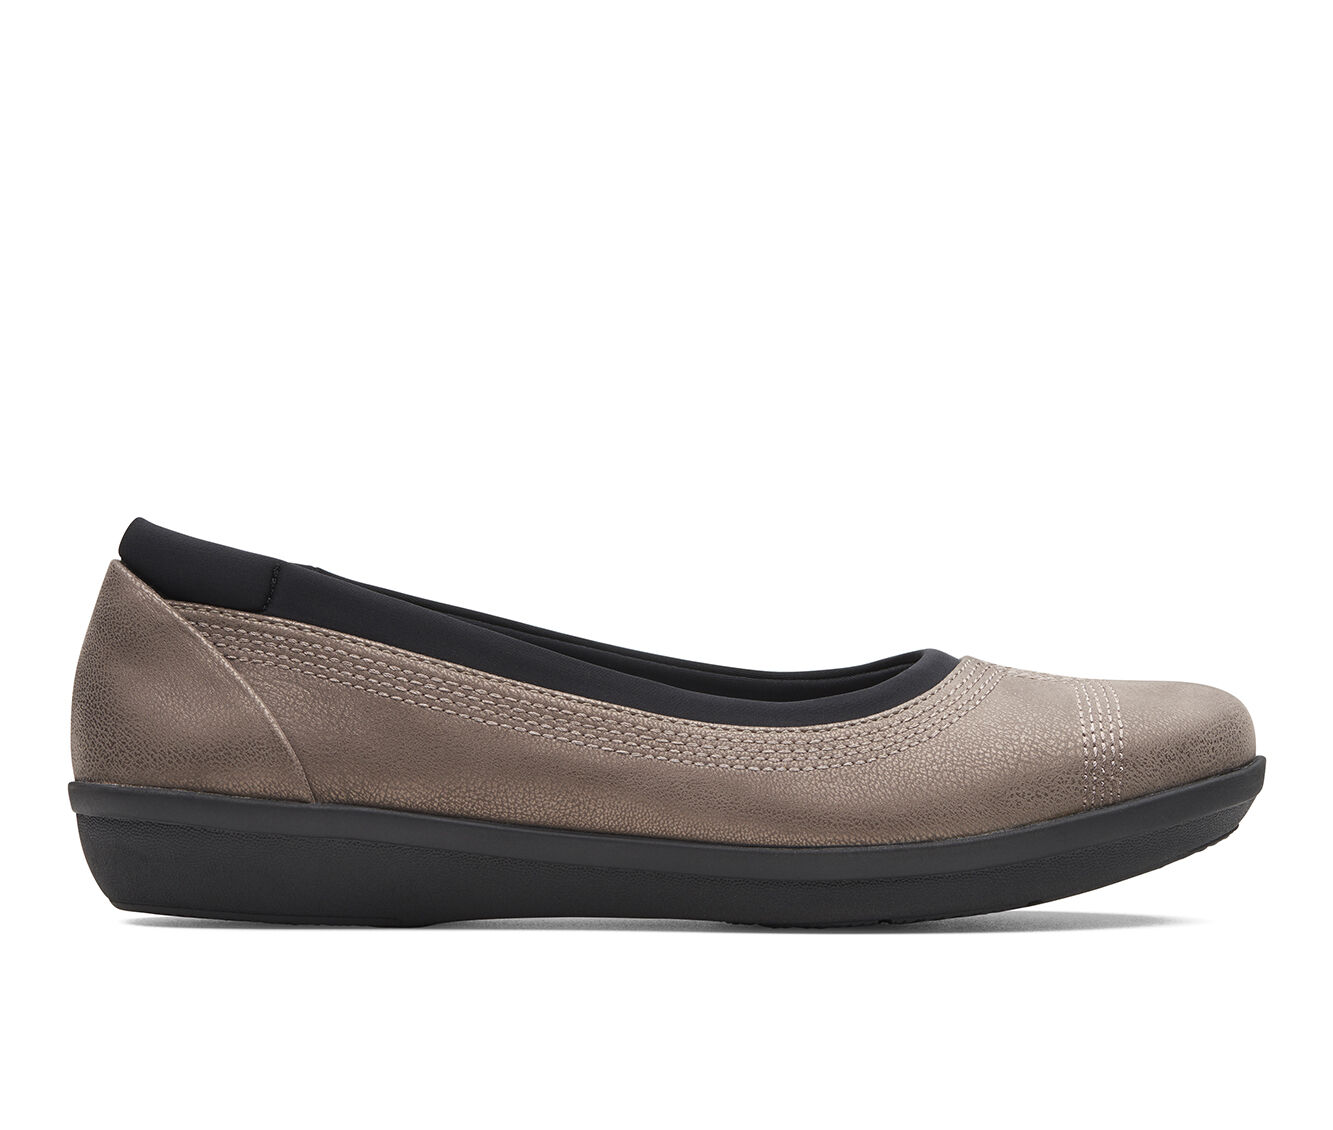 uk shoes_kd5716